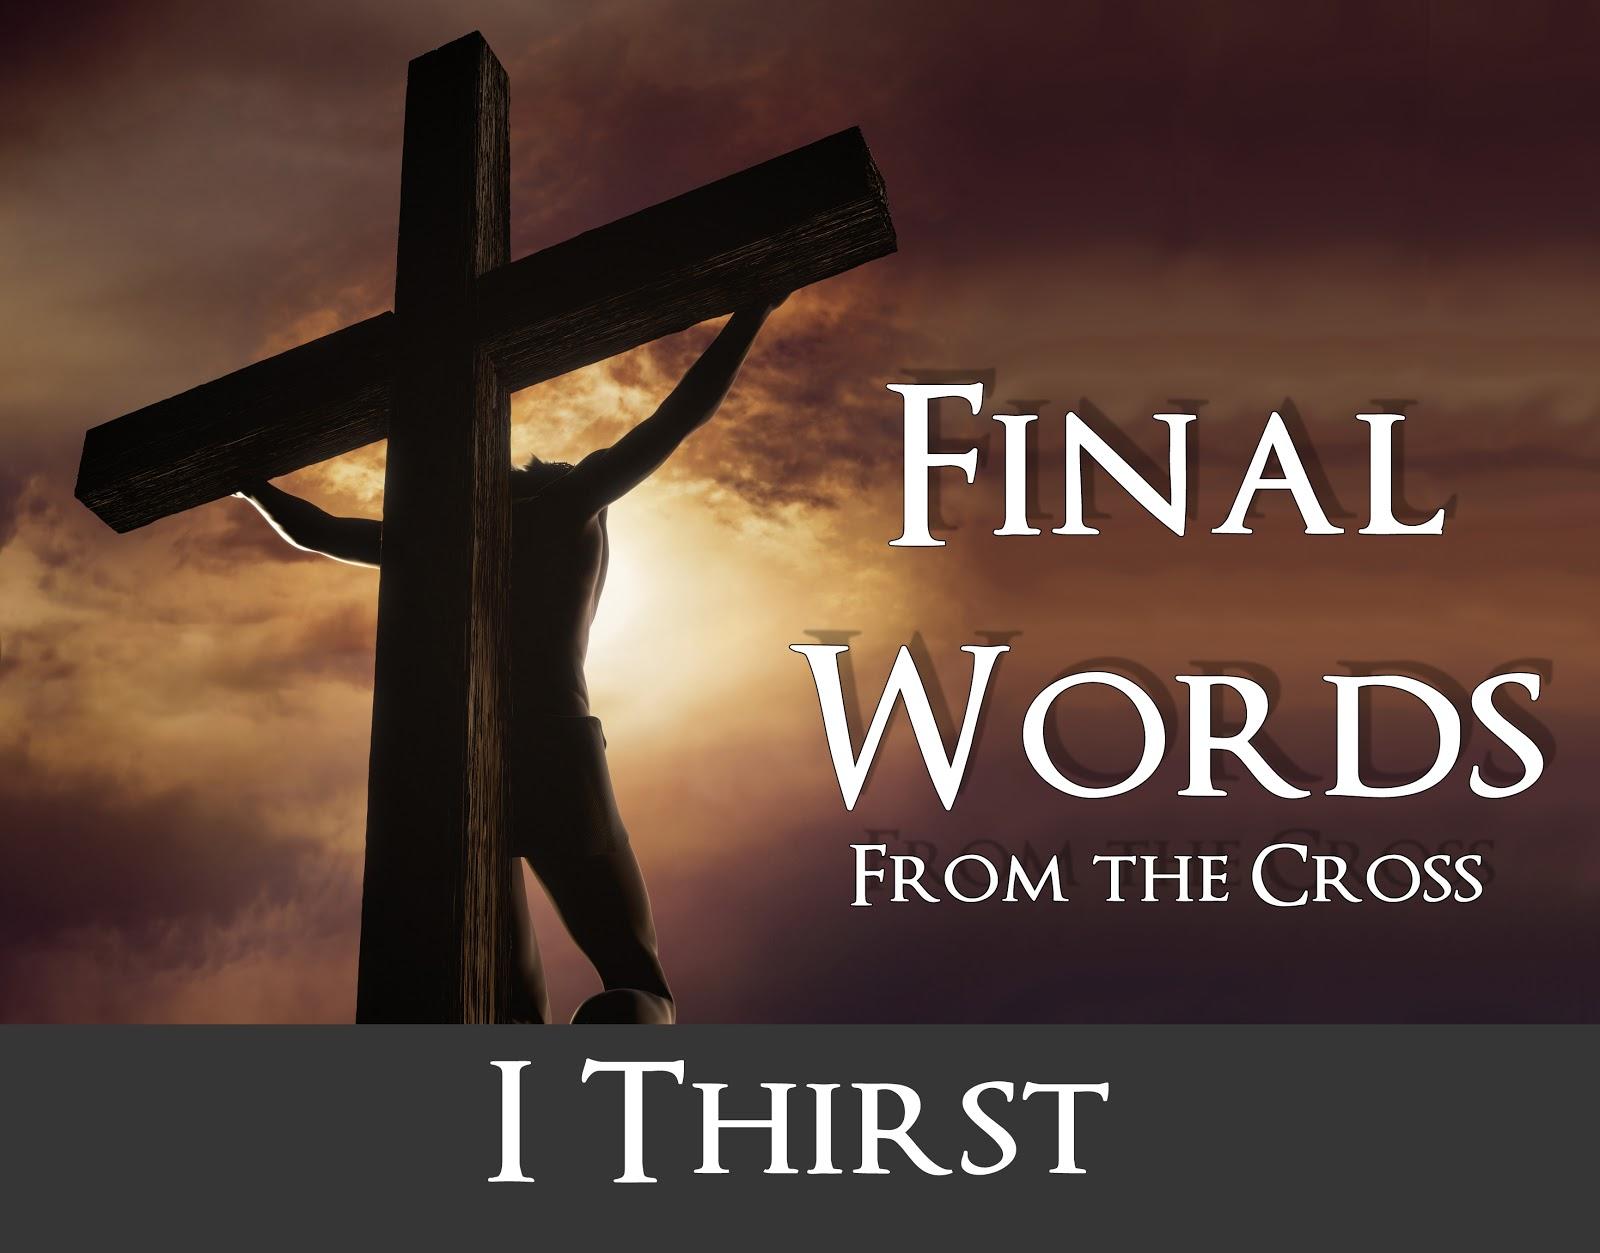 Sayings of Jesus on the cross